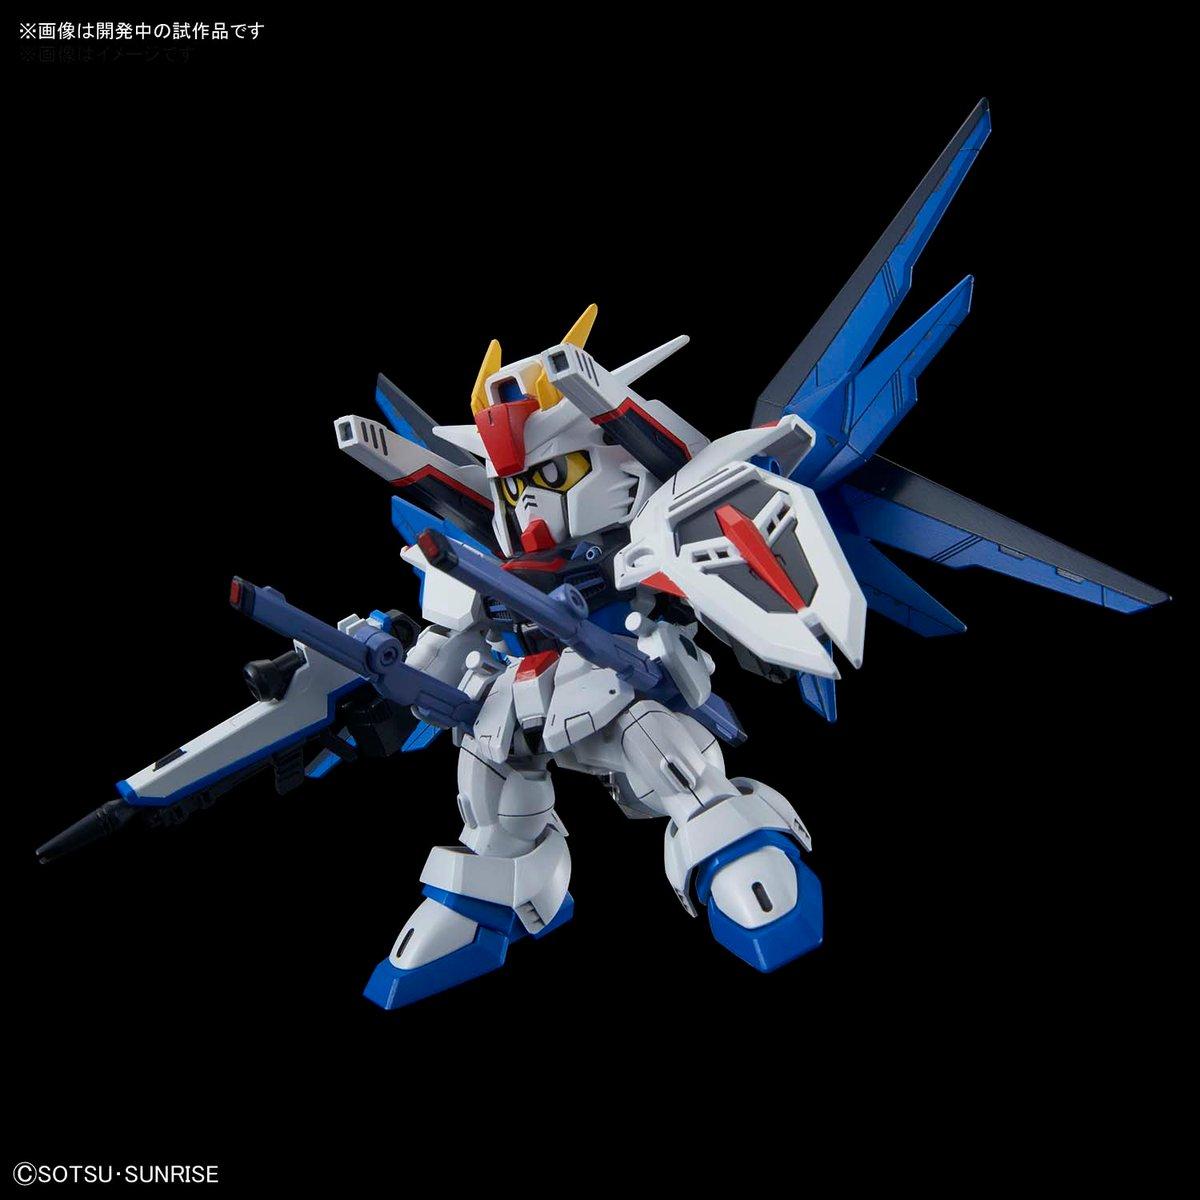 SDCS ZGMF-X10A Freedom Gundam (9)